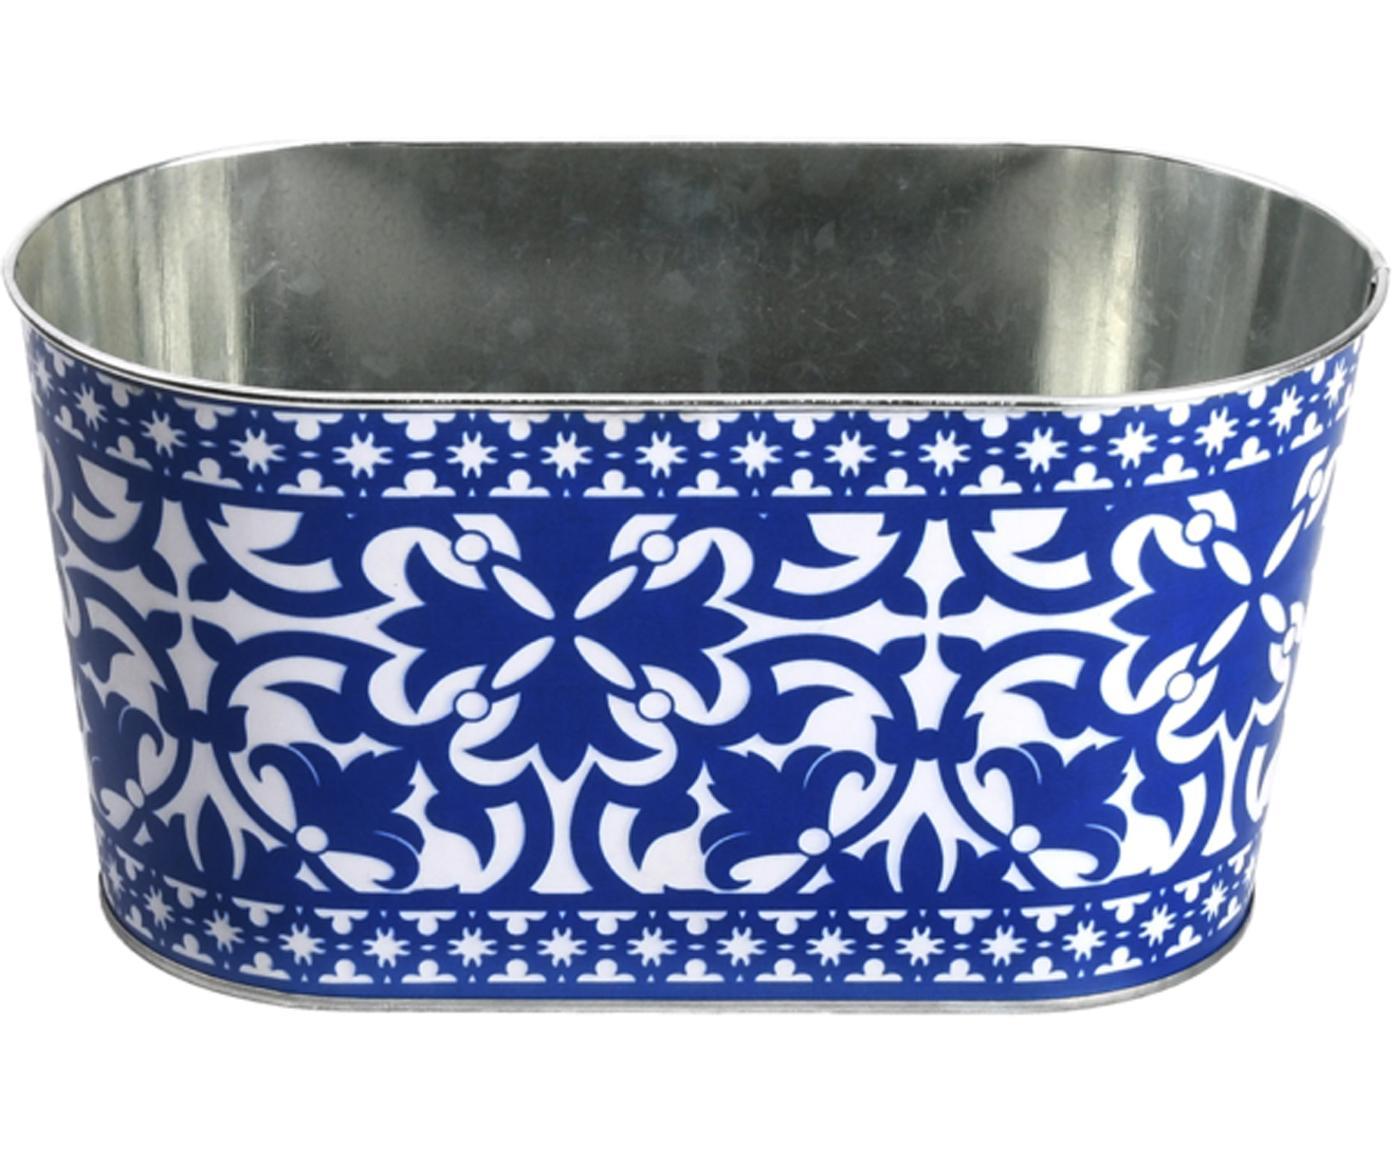 Übertopf Barcelona, Metall, beschichtet, Blau, Weiß, 23 x 12 cm